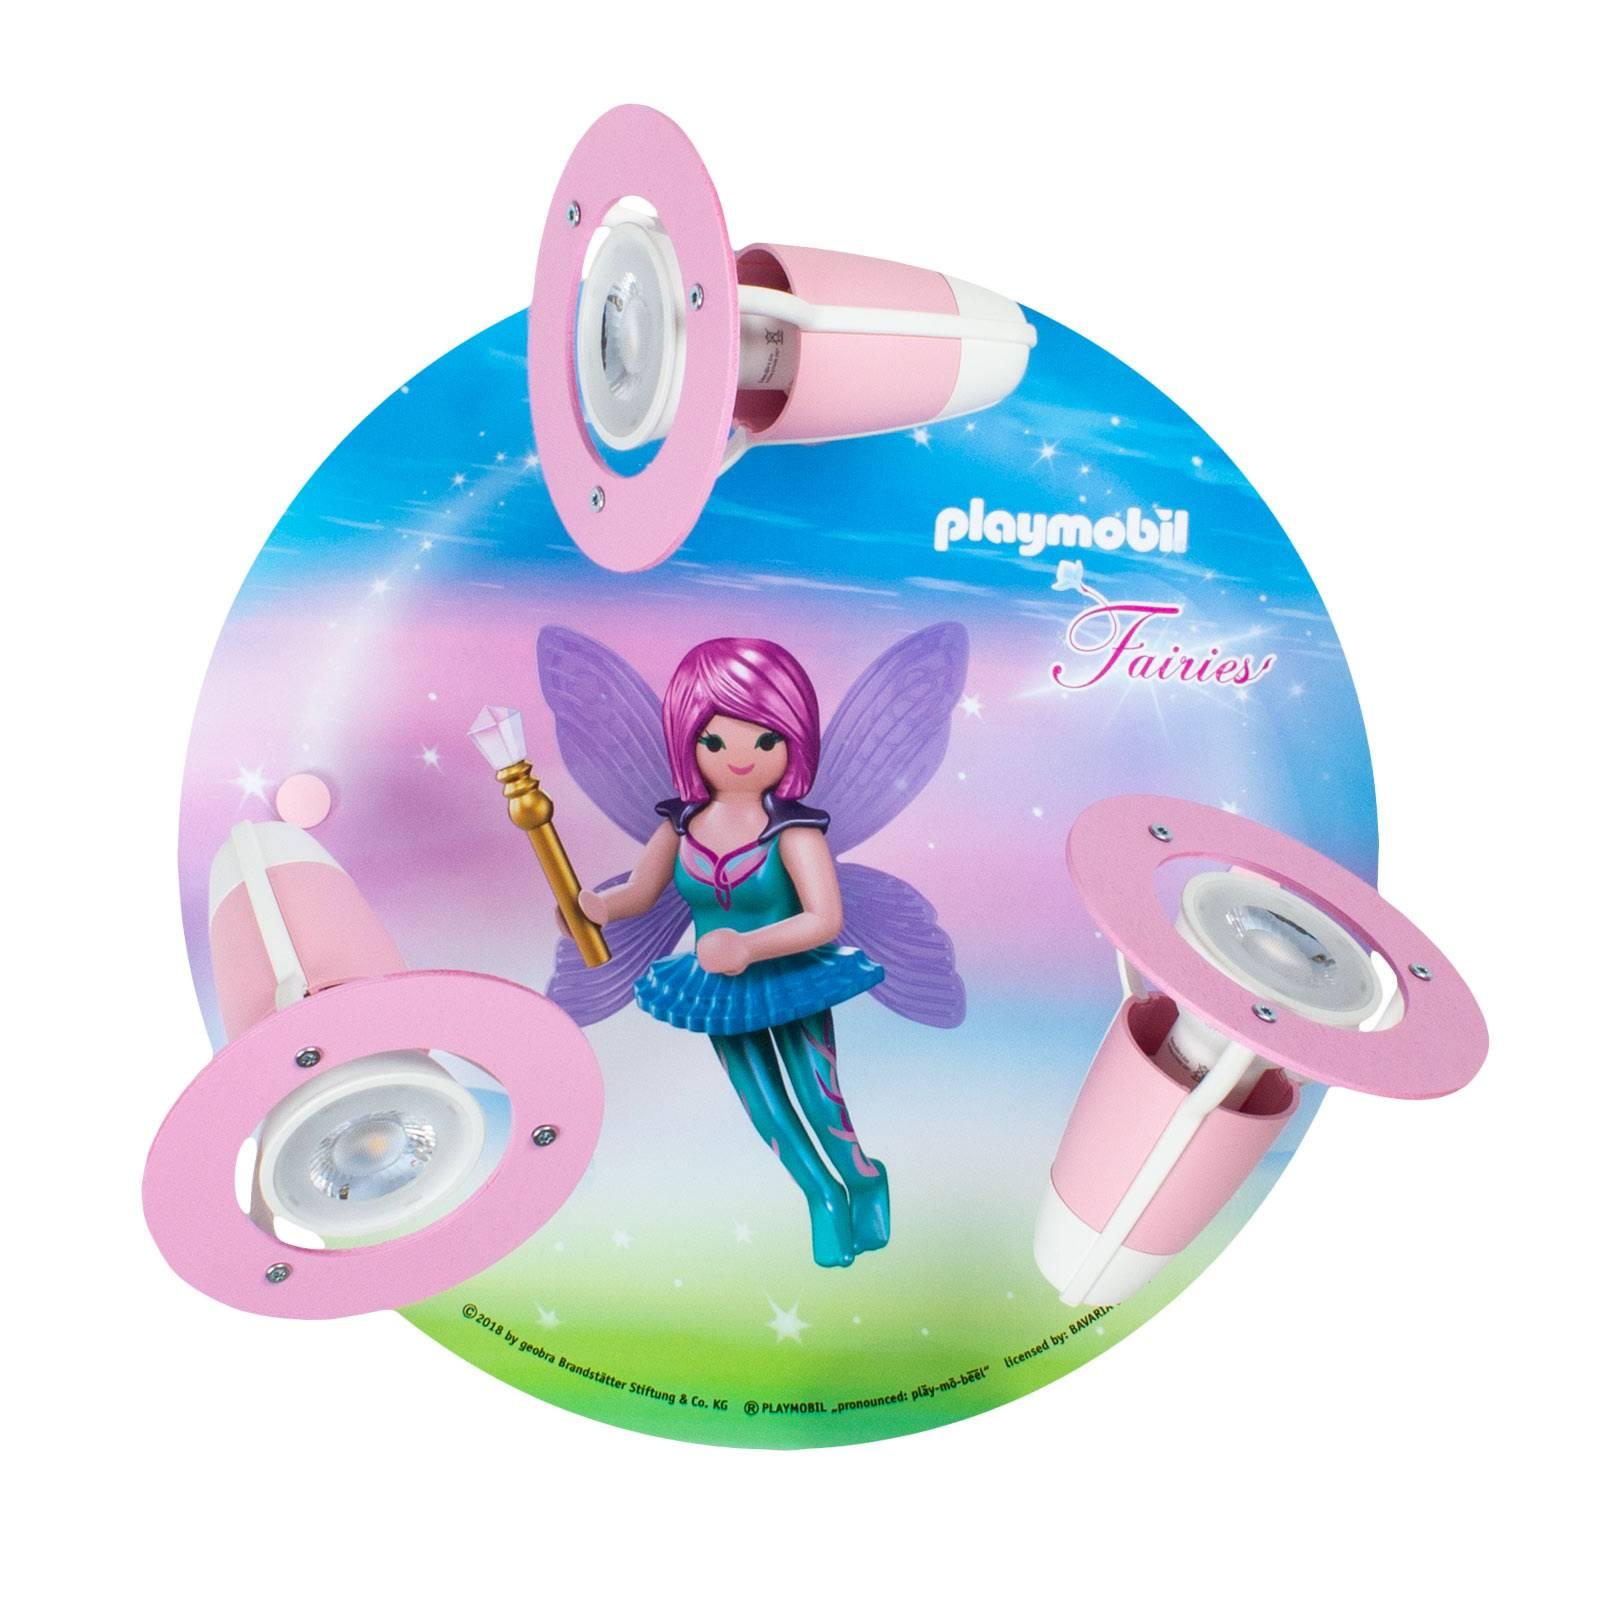 Plafondlamp 3 per spot PLAYMOBIL Fairies